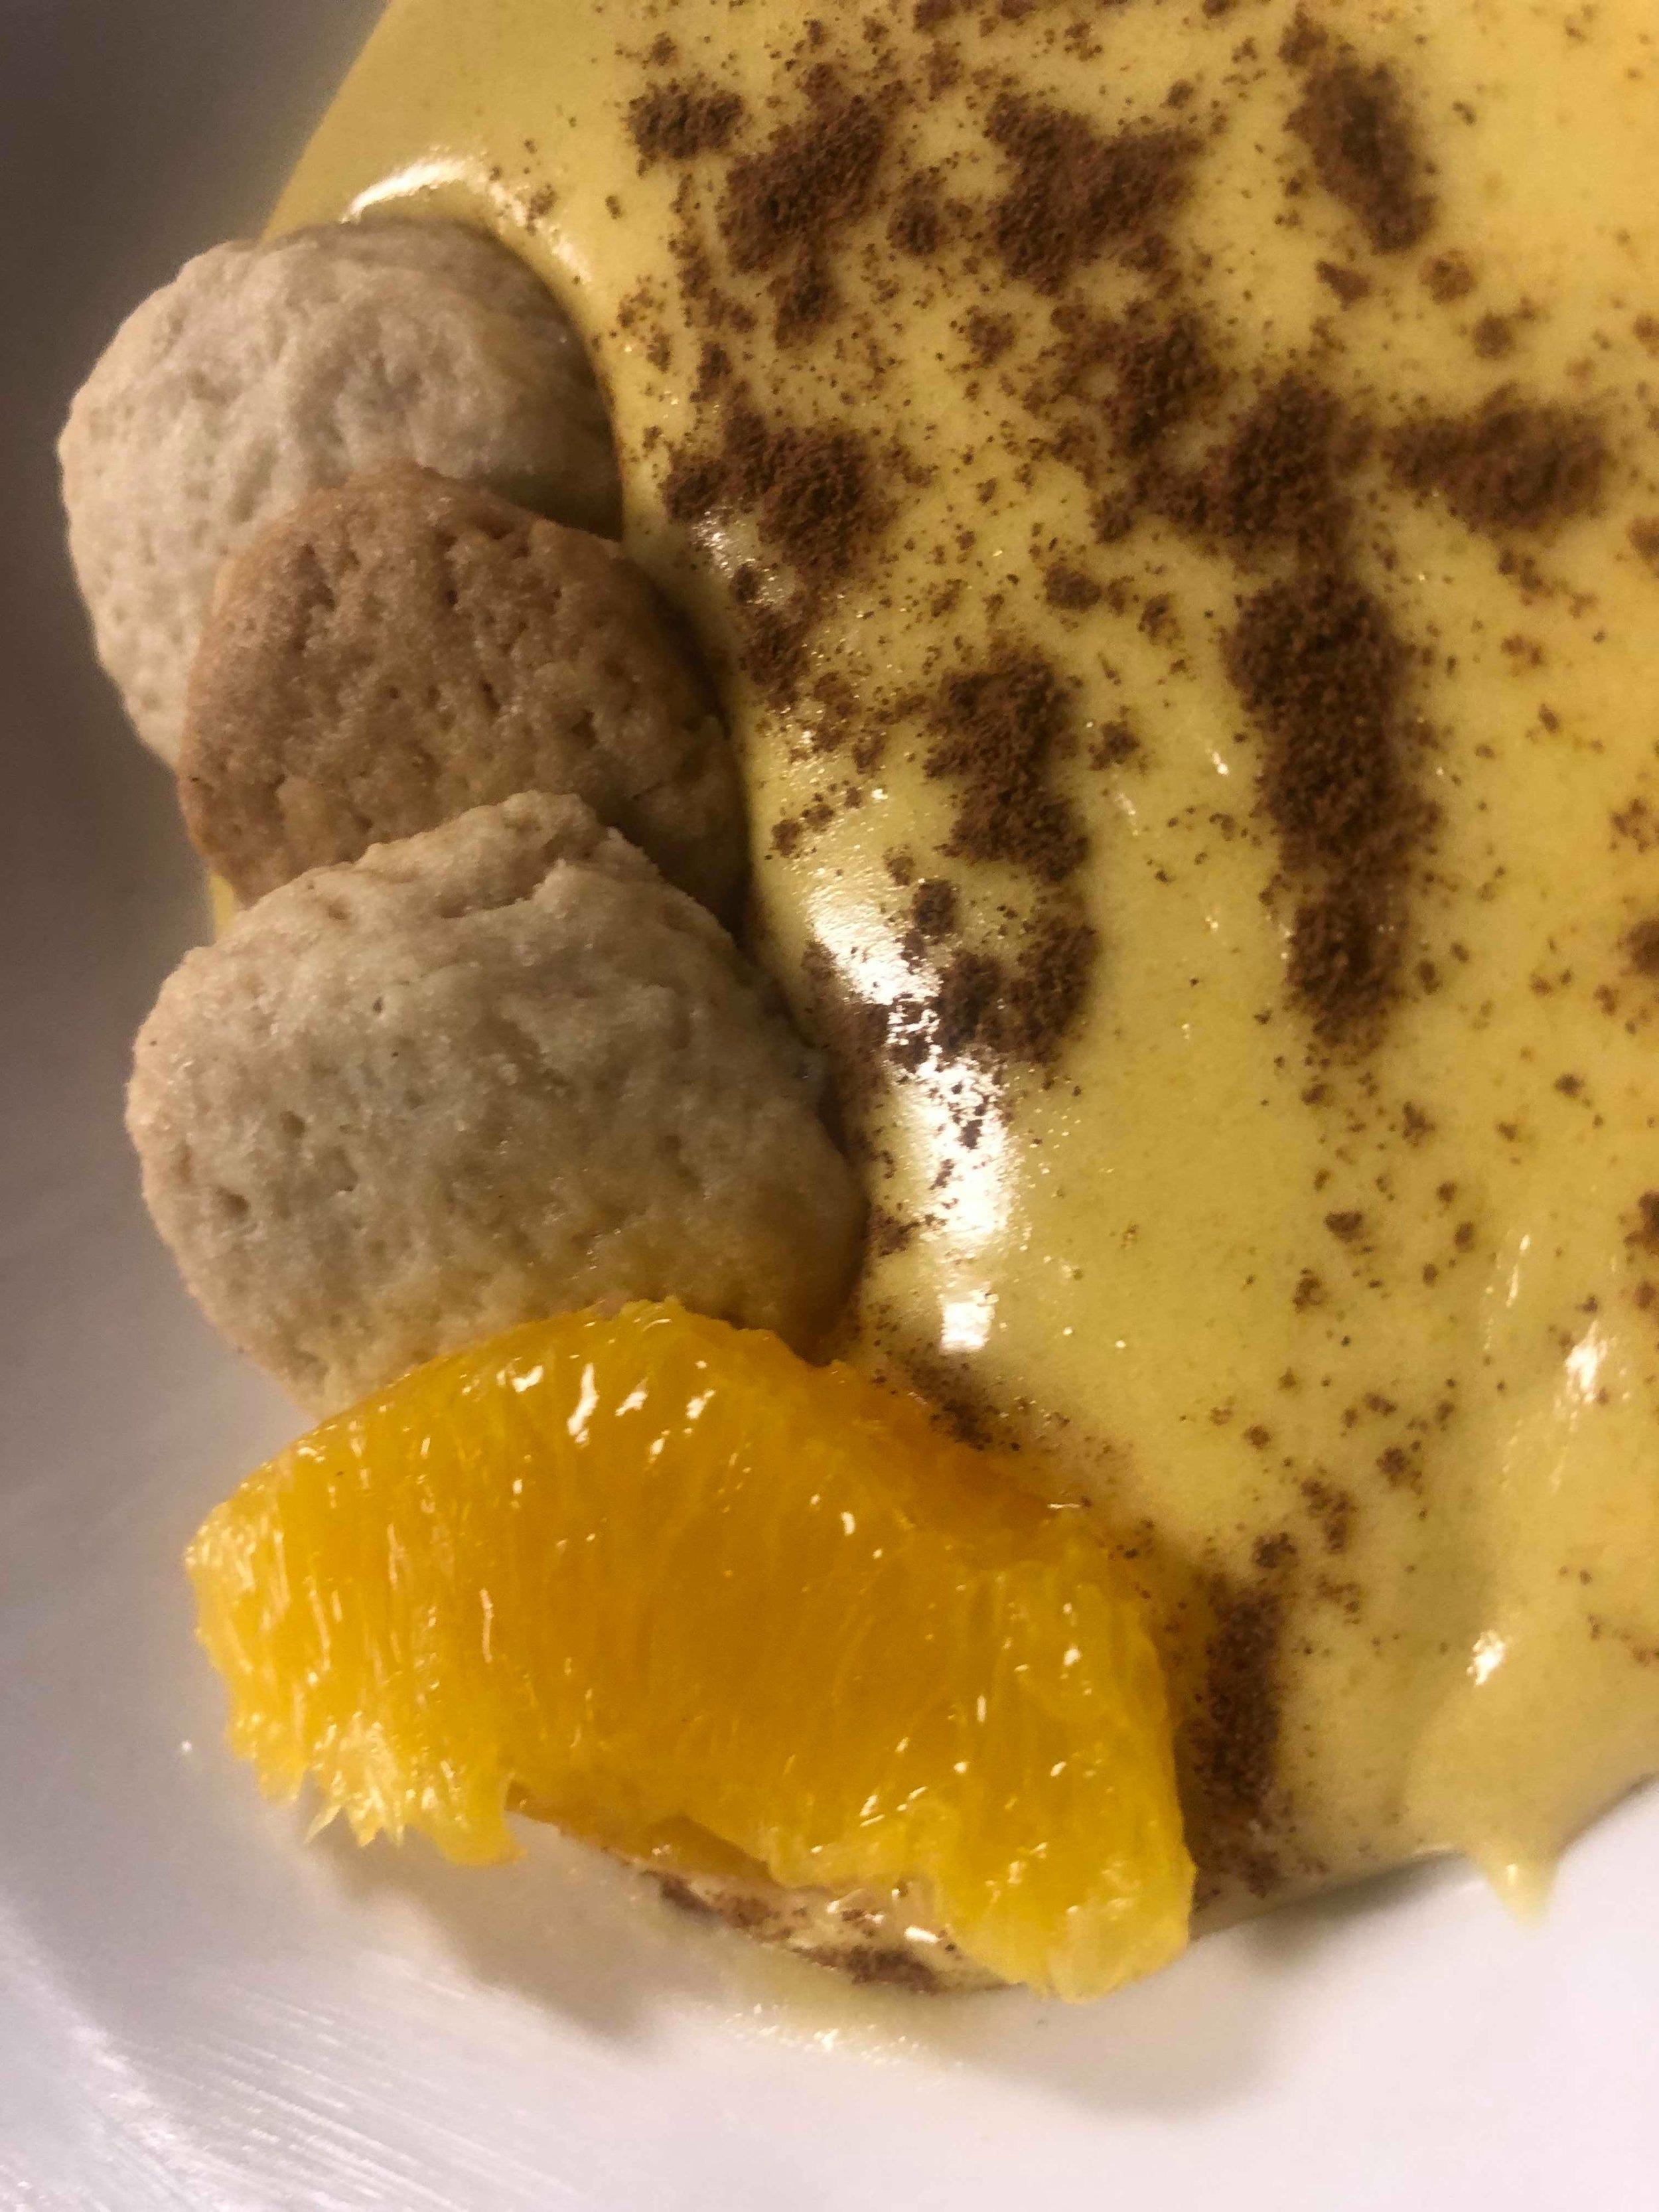 Fifth Course: Dessert